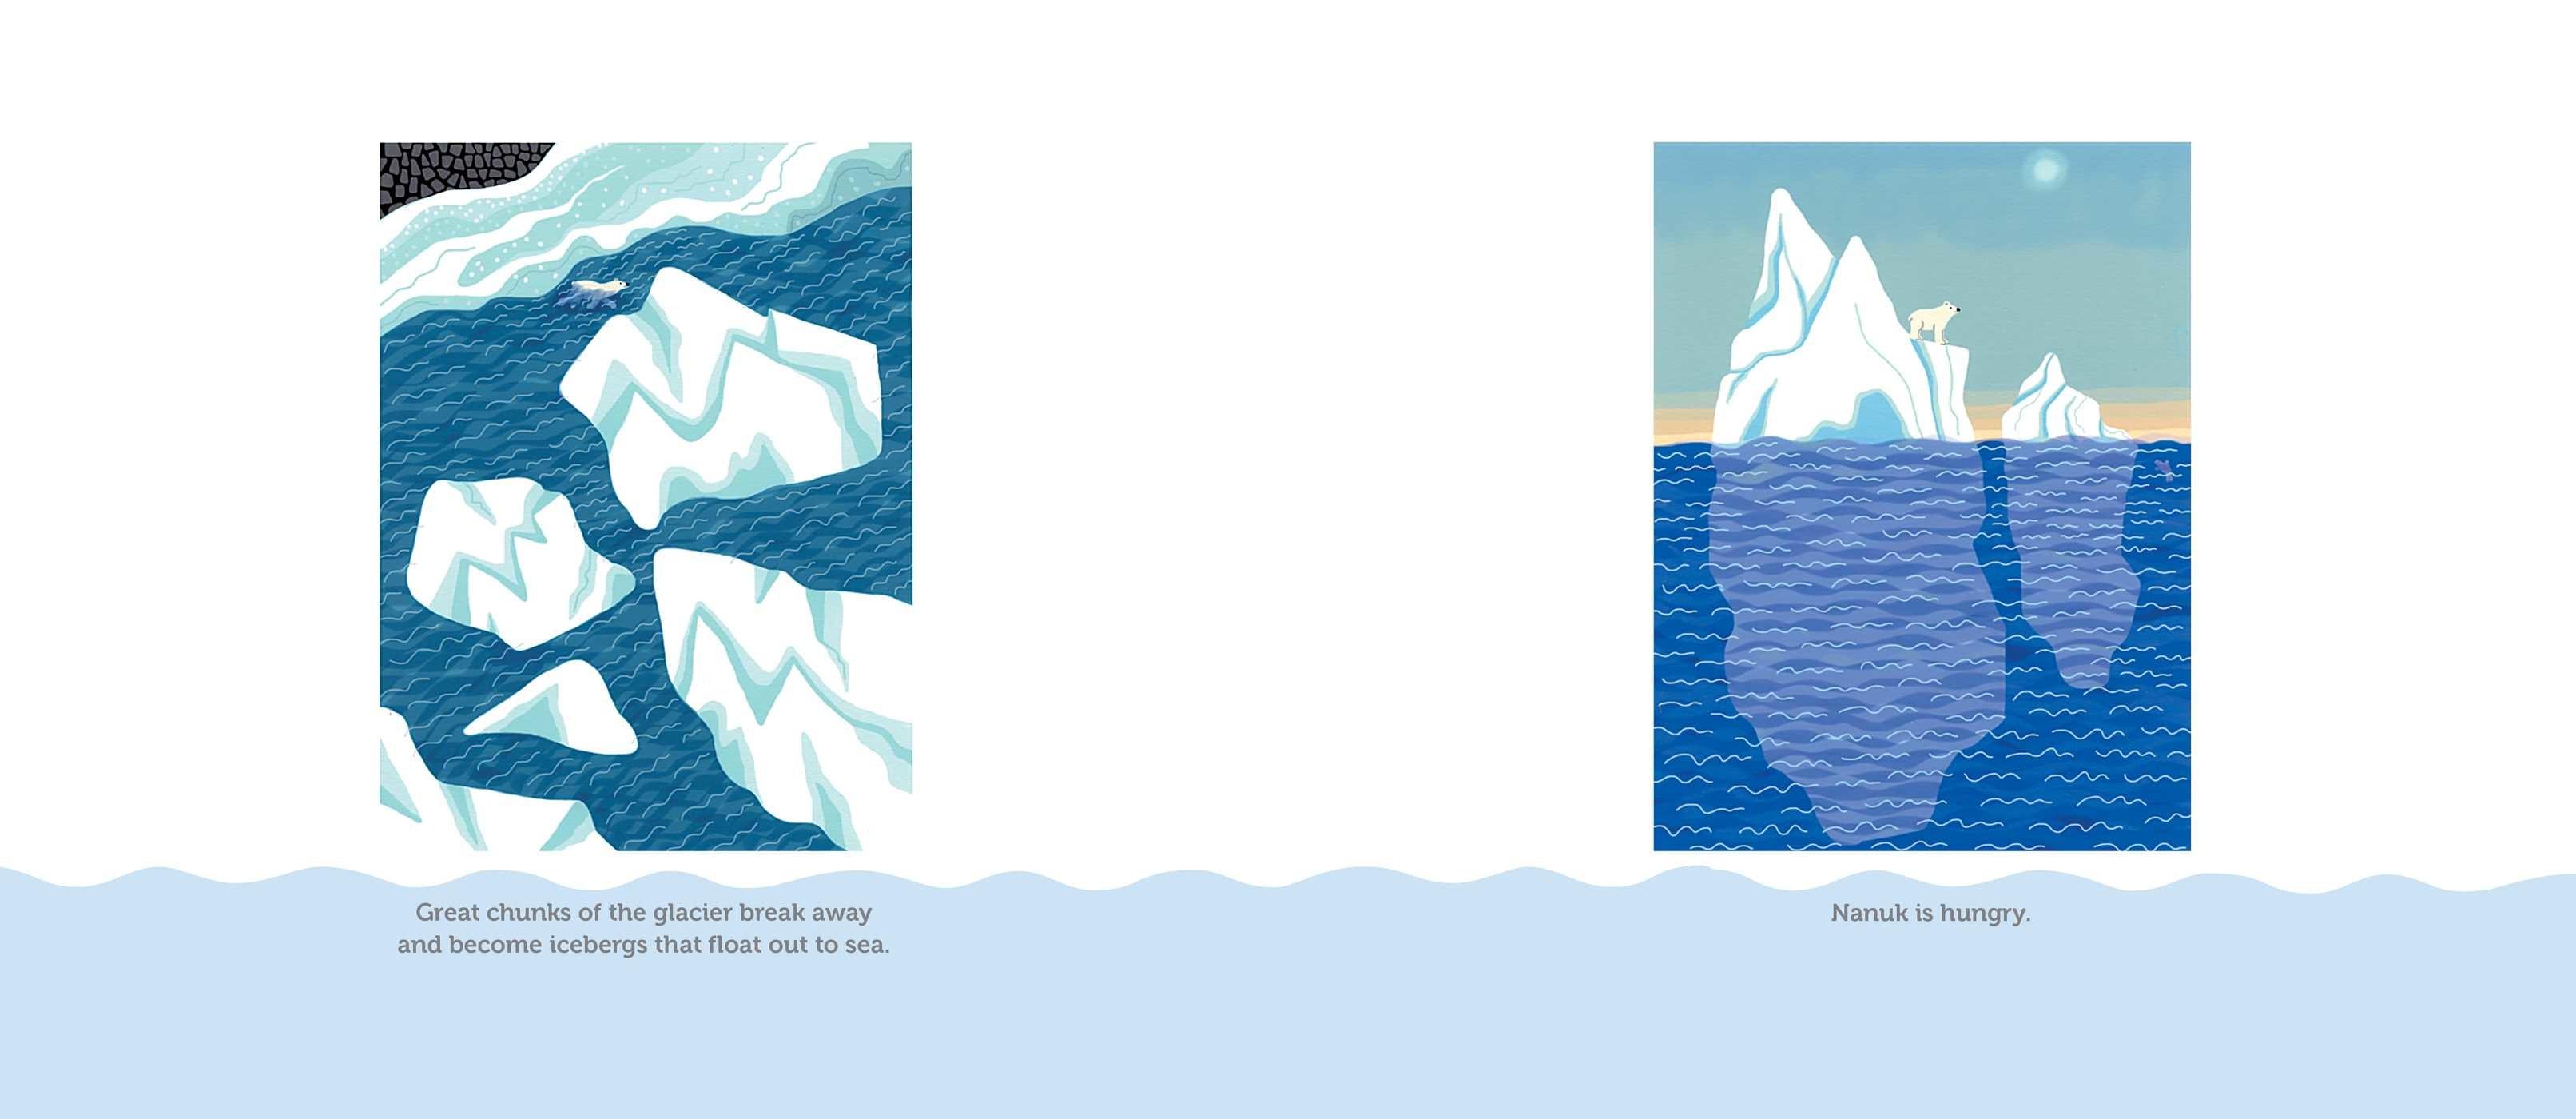 Nanuk the ice bear 9781481446679.in02